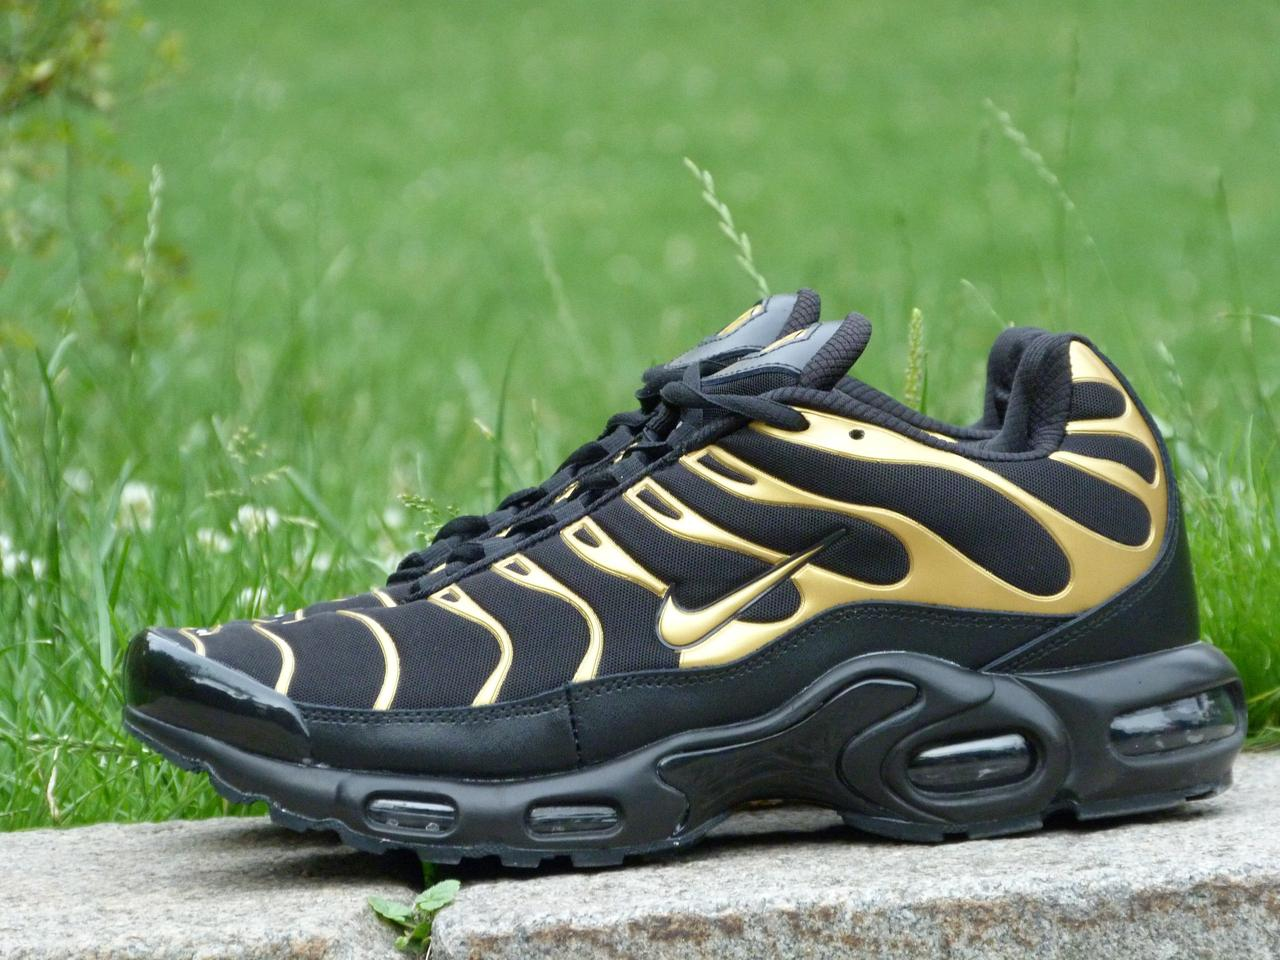 Мужские кроссовки Nike Air Max Nike Tn+ топ реплика